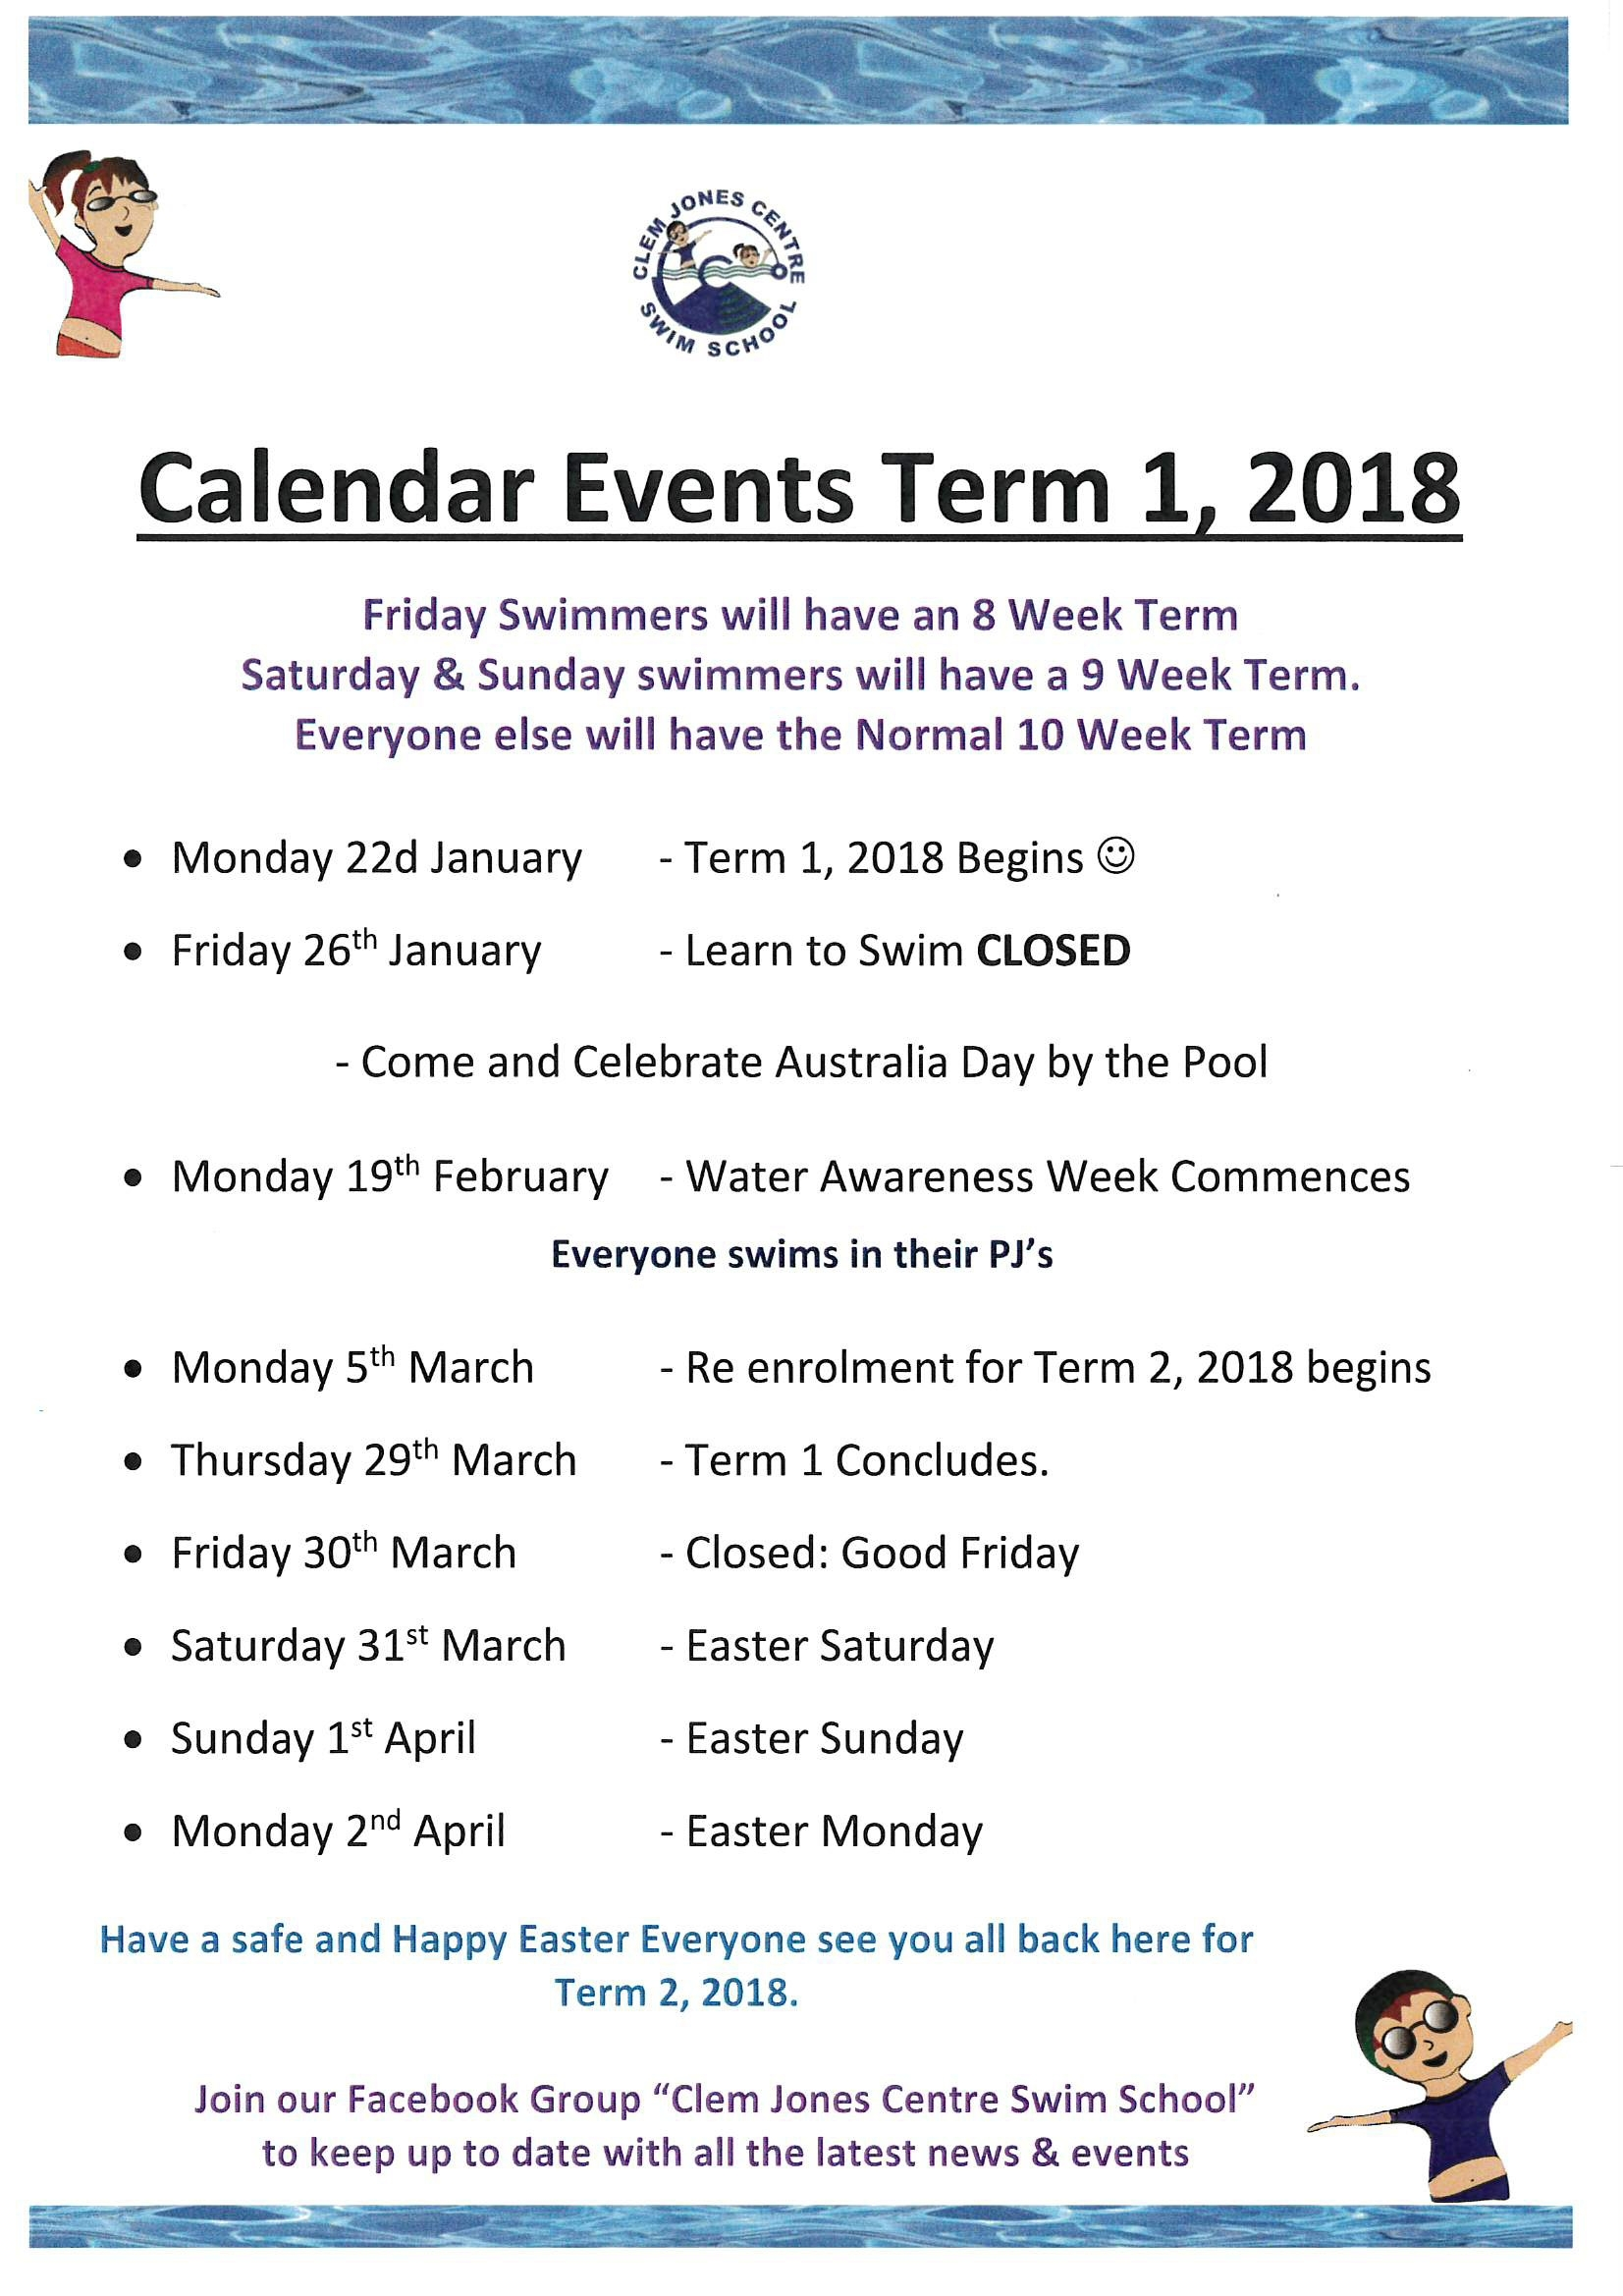 Calendar Events : Term 1, 2018 | Clem Jones Centre in Calender Of Term 1 Events